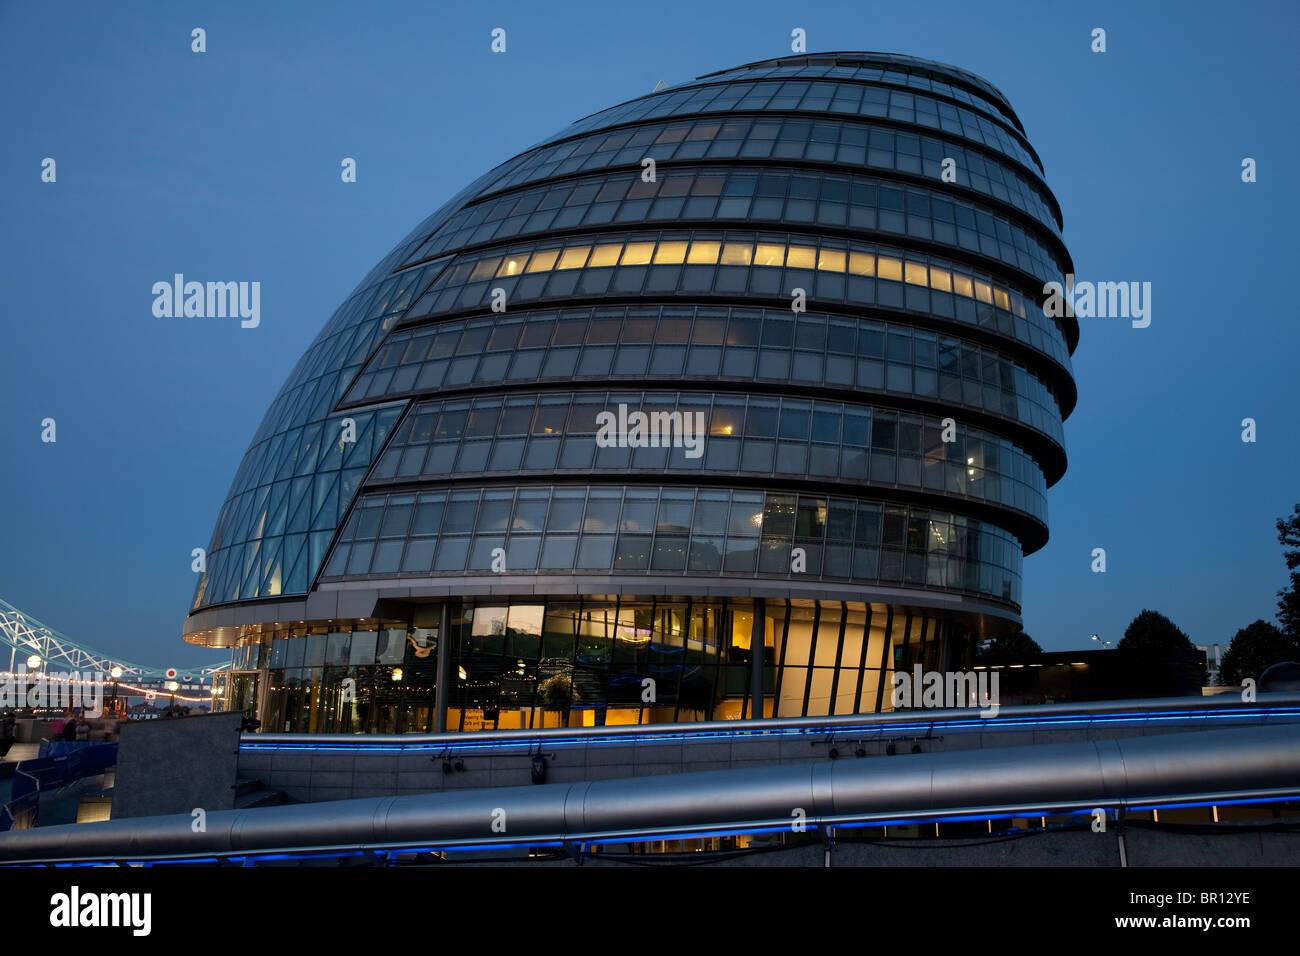 London City Hall illuminated at night, GLA, London - Stock Image